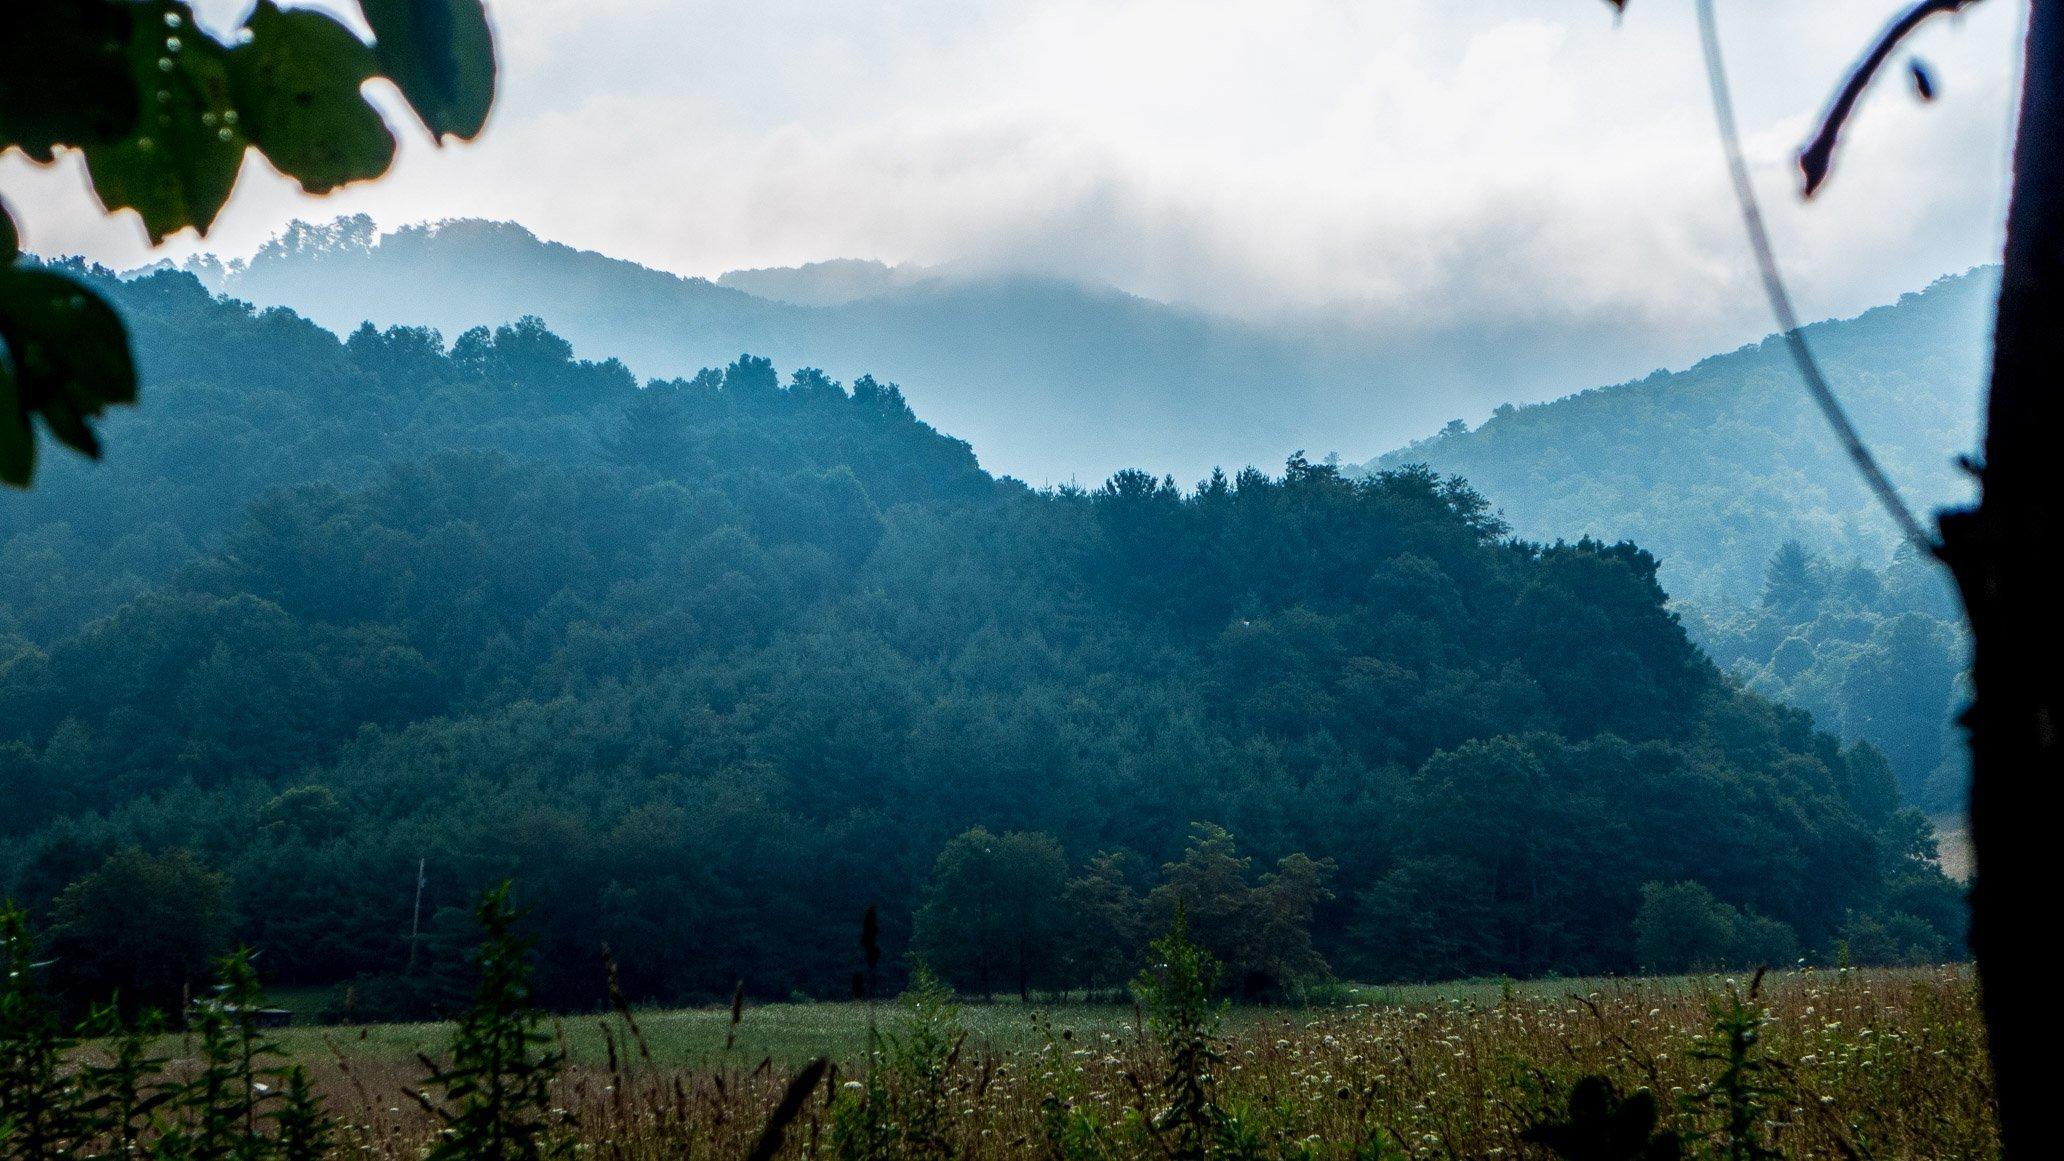 Mountain City Sunrise in the fog, Bryan Thatcher